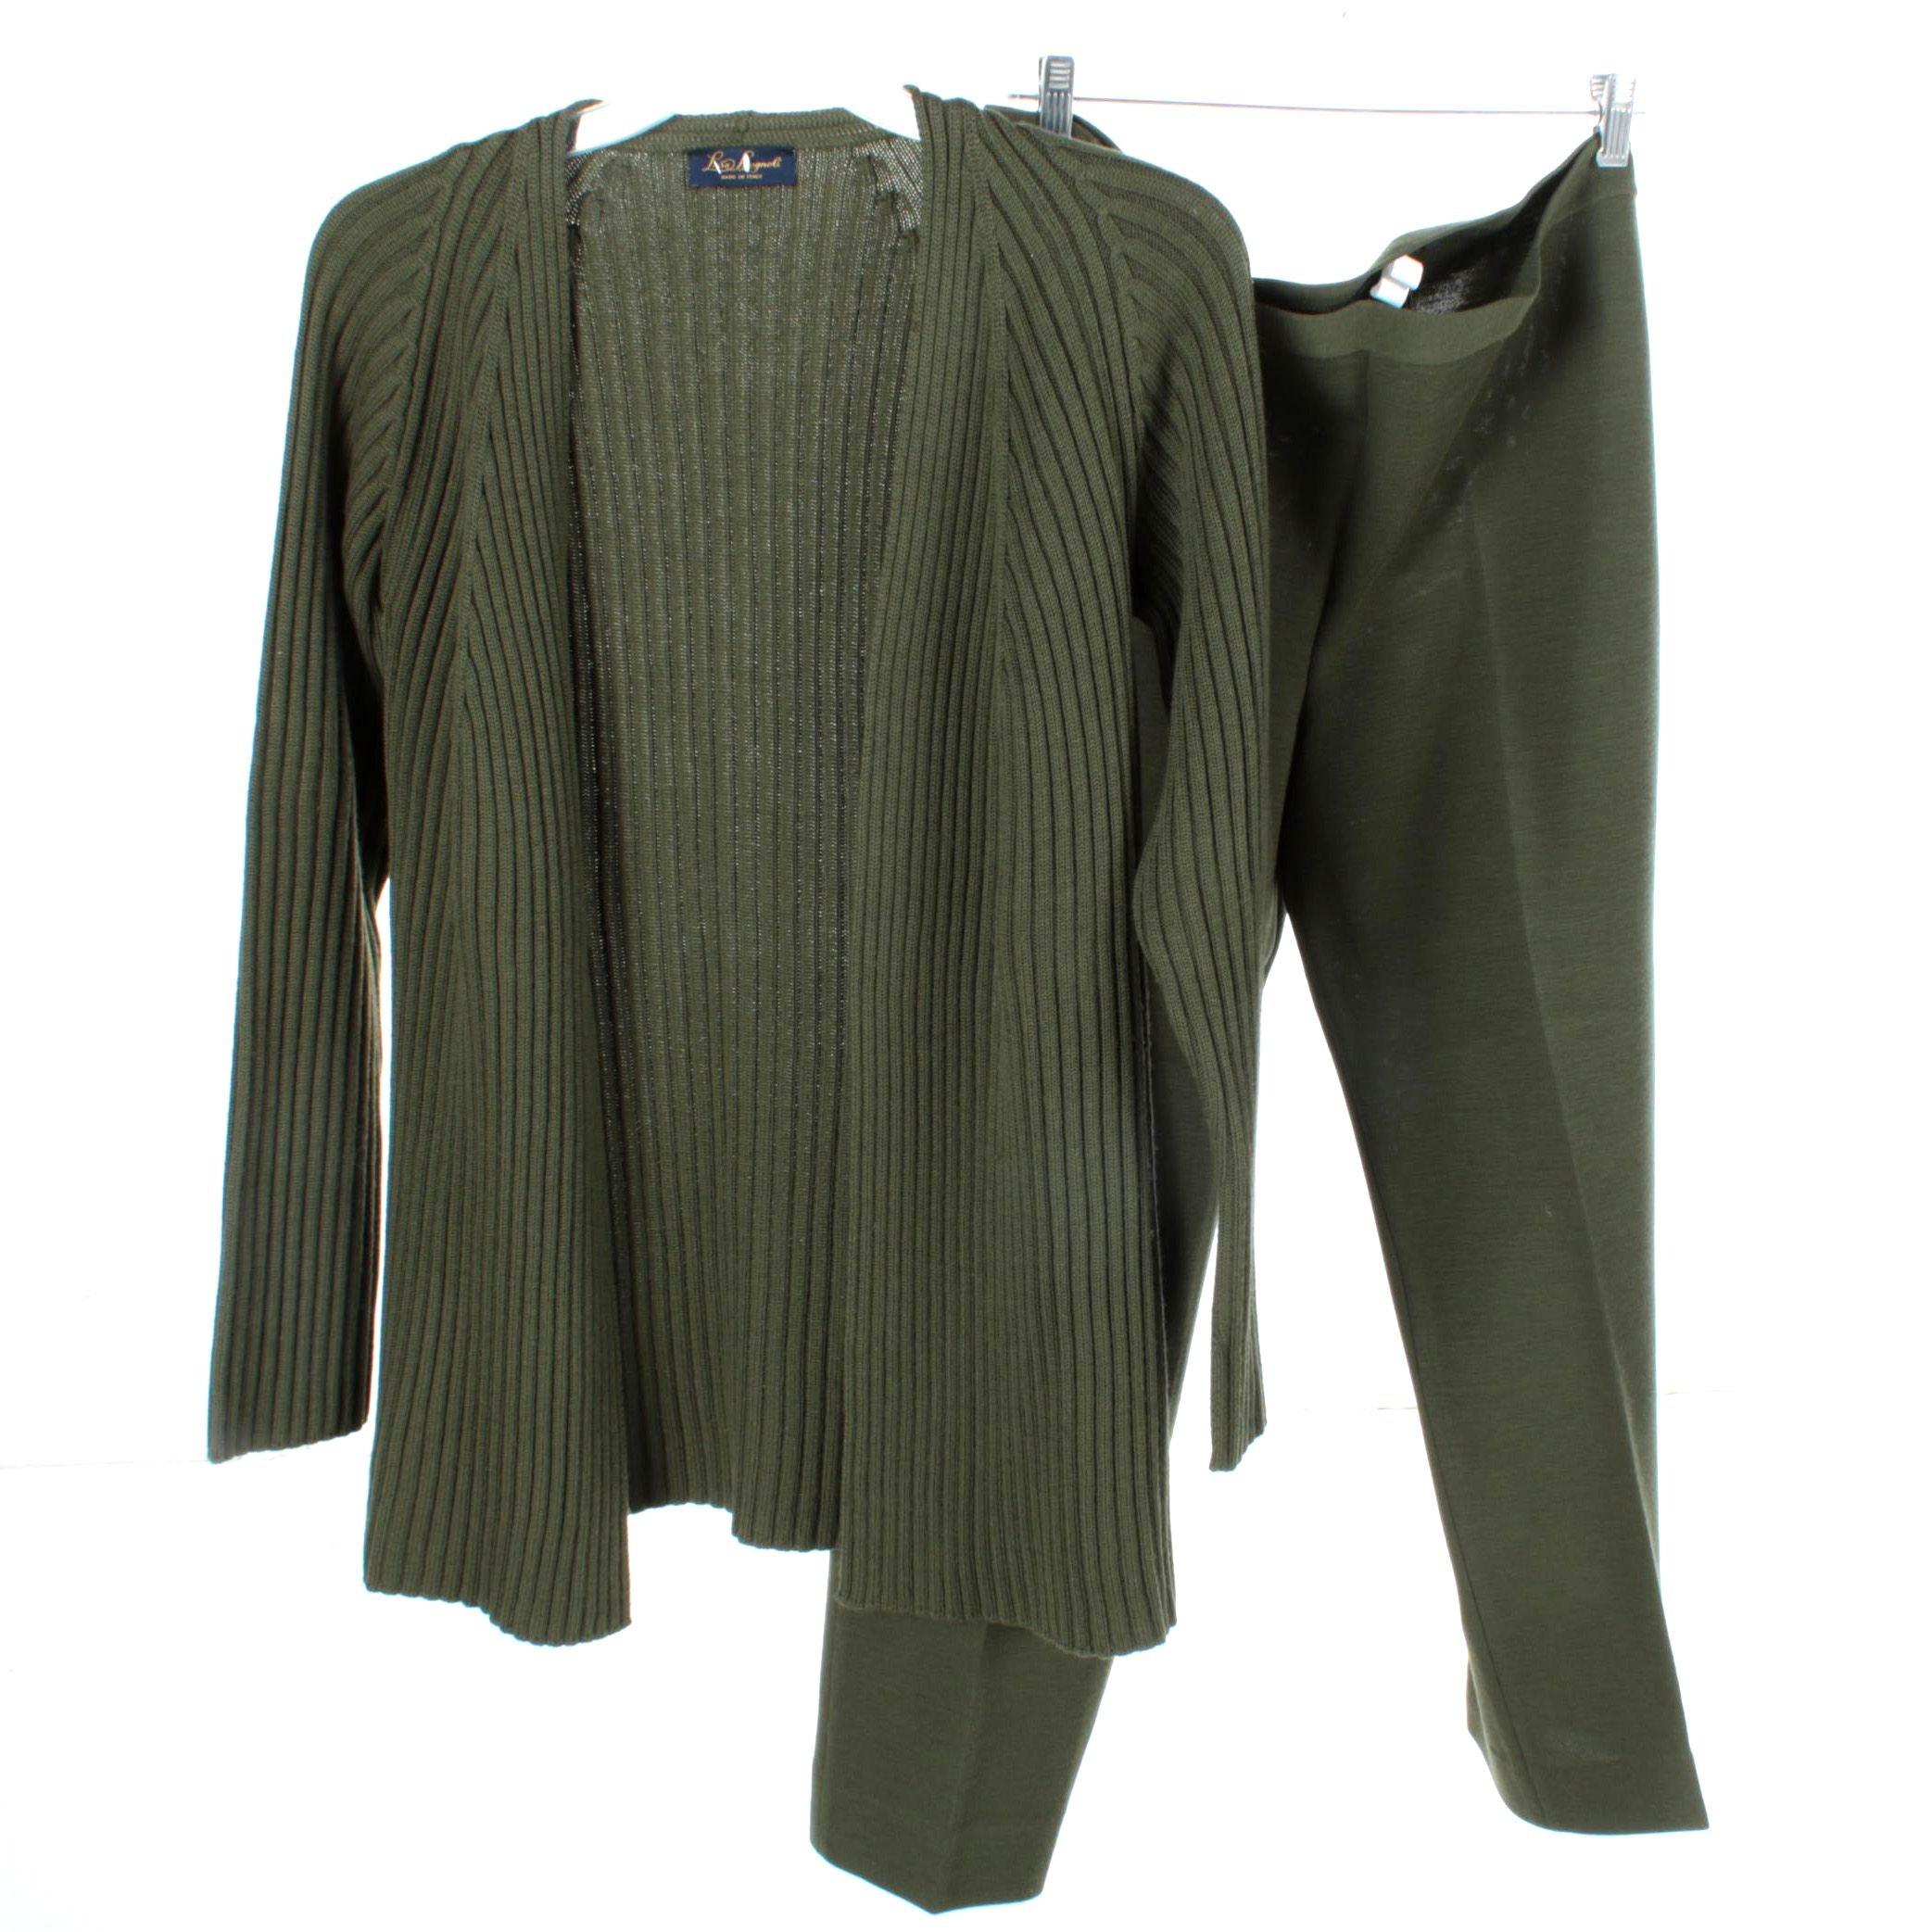 Luisa Ragnoli Sweater and Pant Set